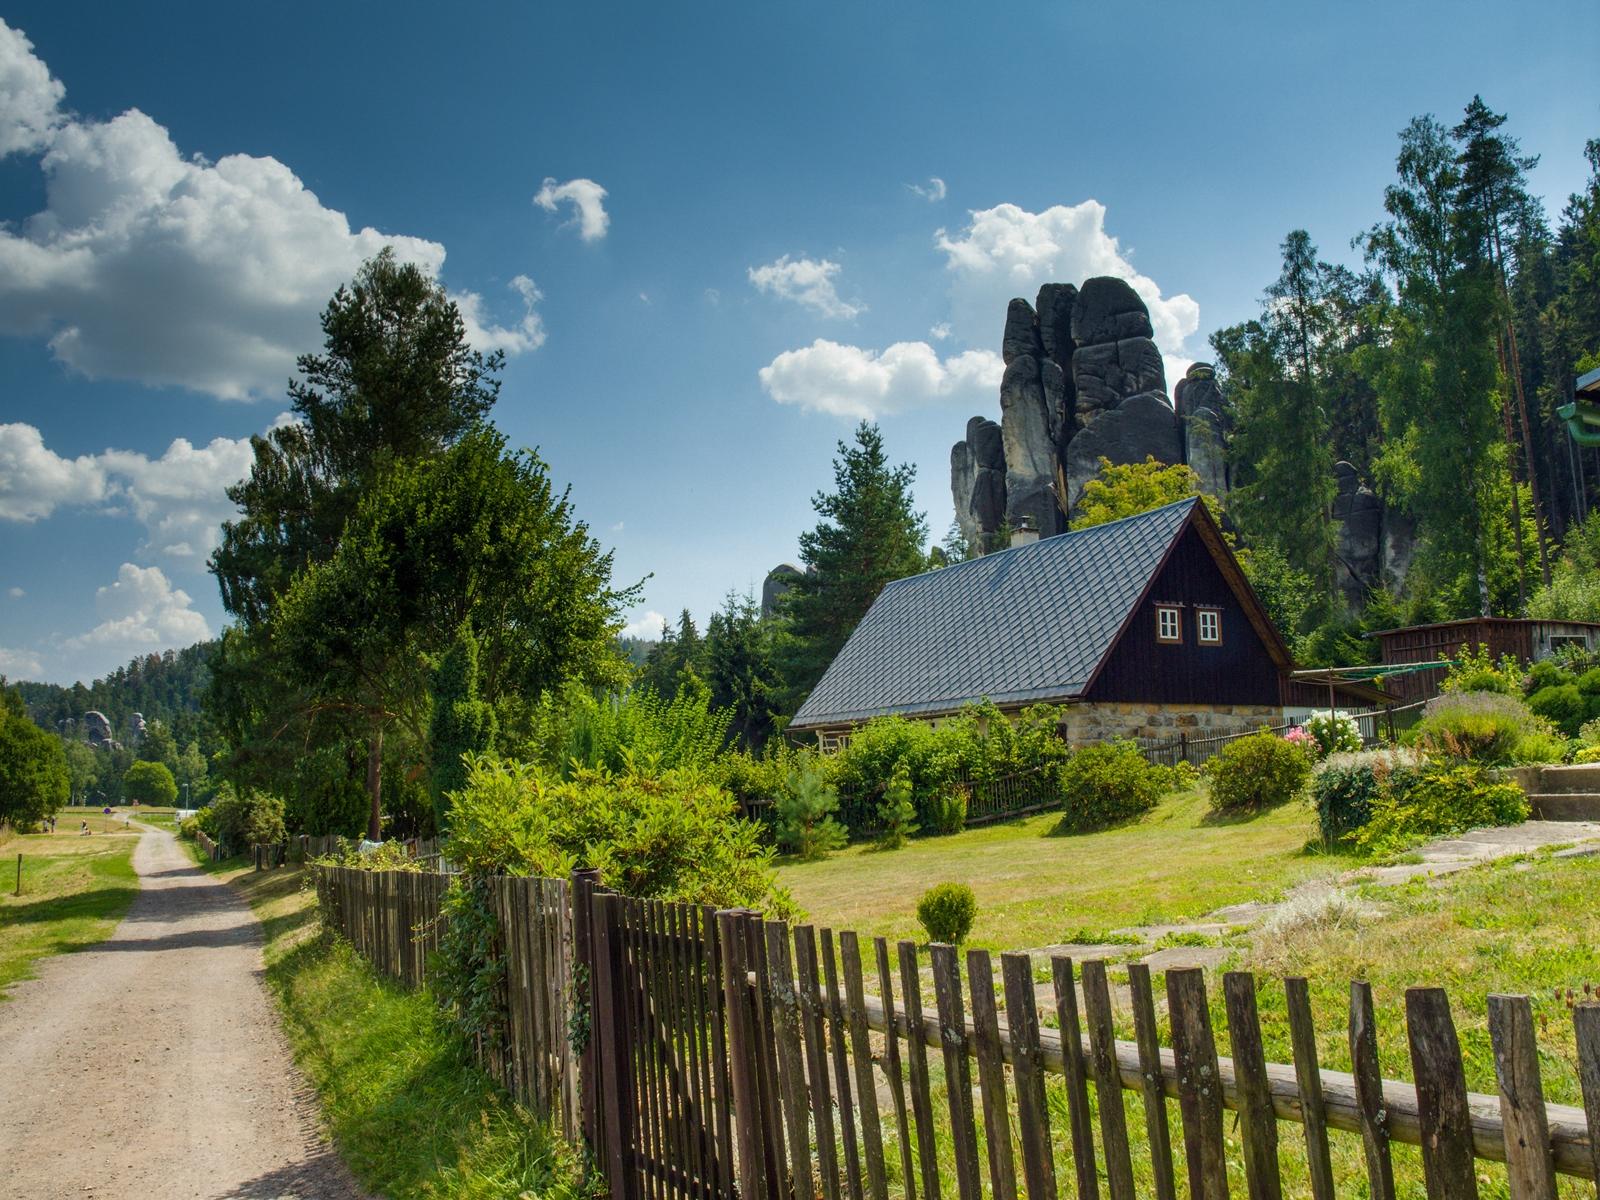 Landscape of Adrspach, Czech Republic